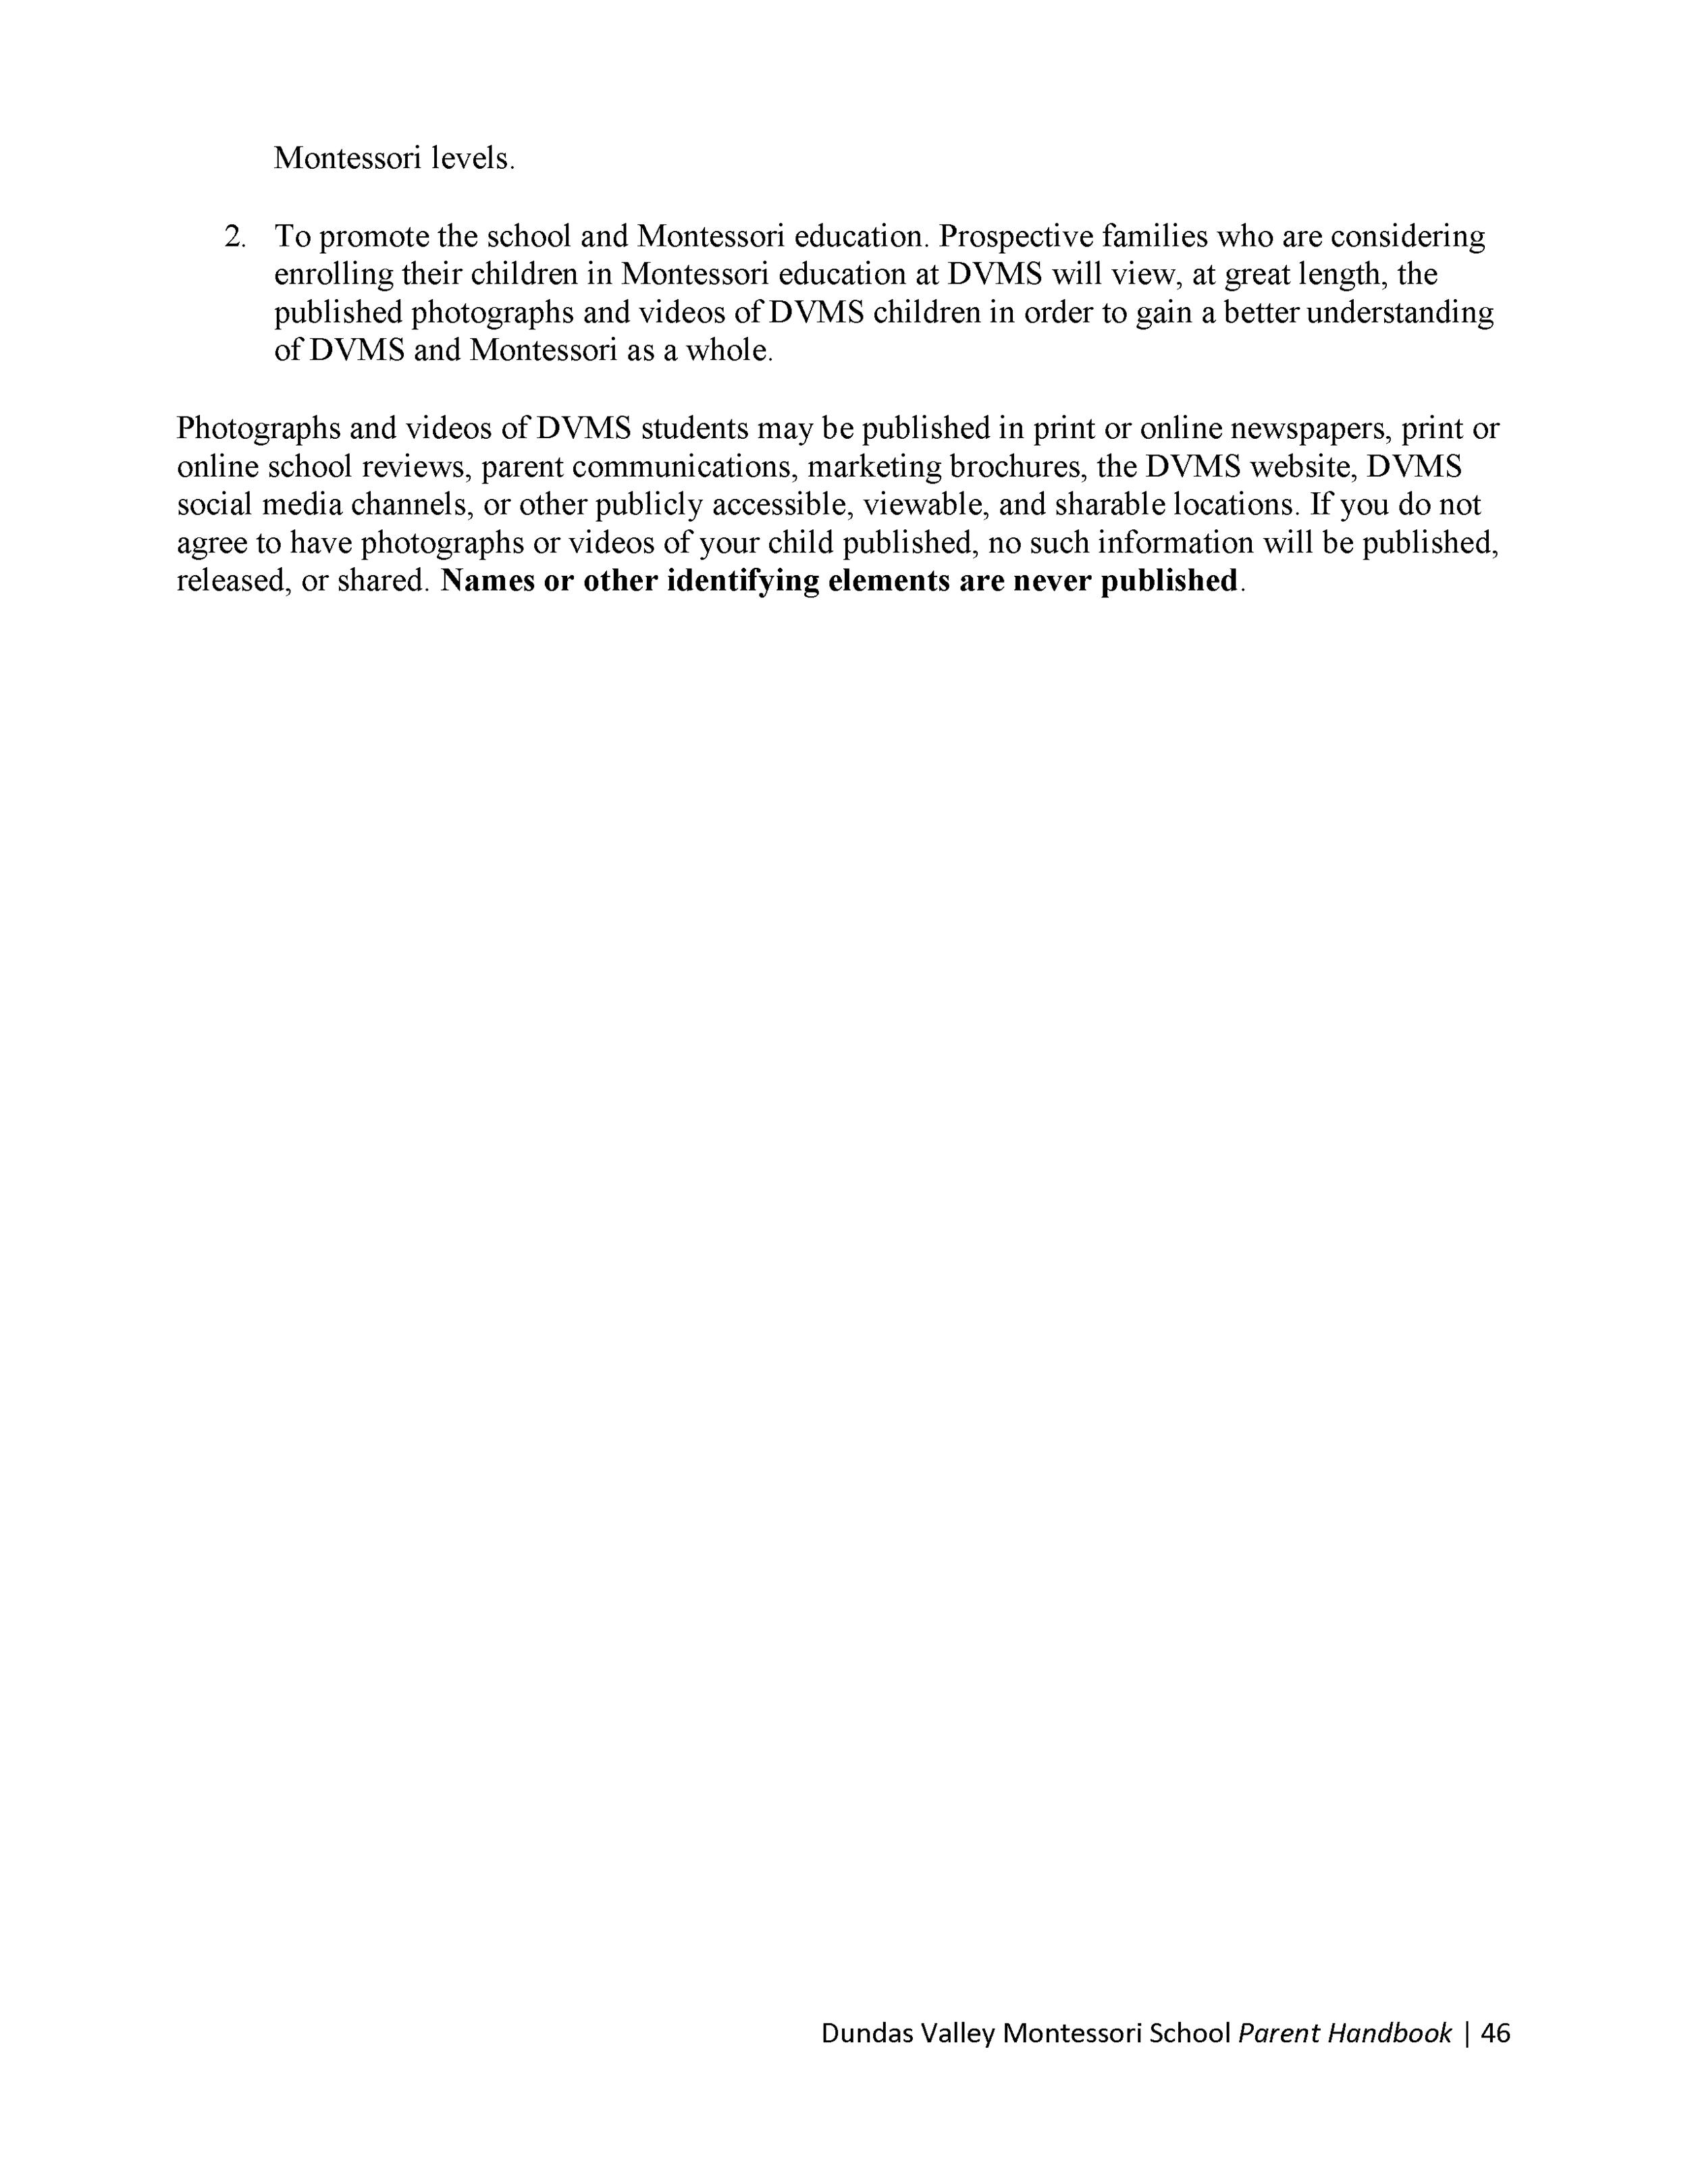 DVMS-Parent-Handbook-19-20_Page_048.png